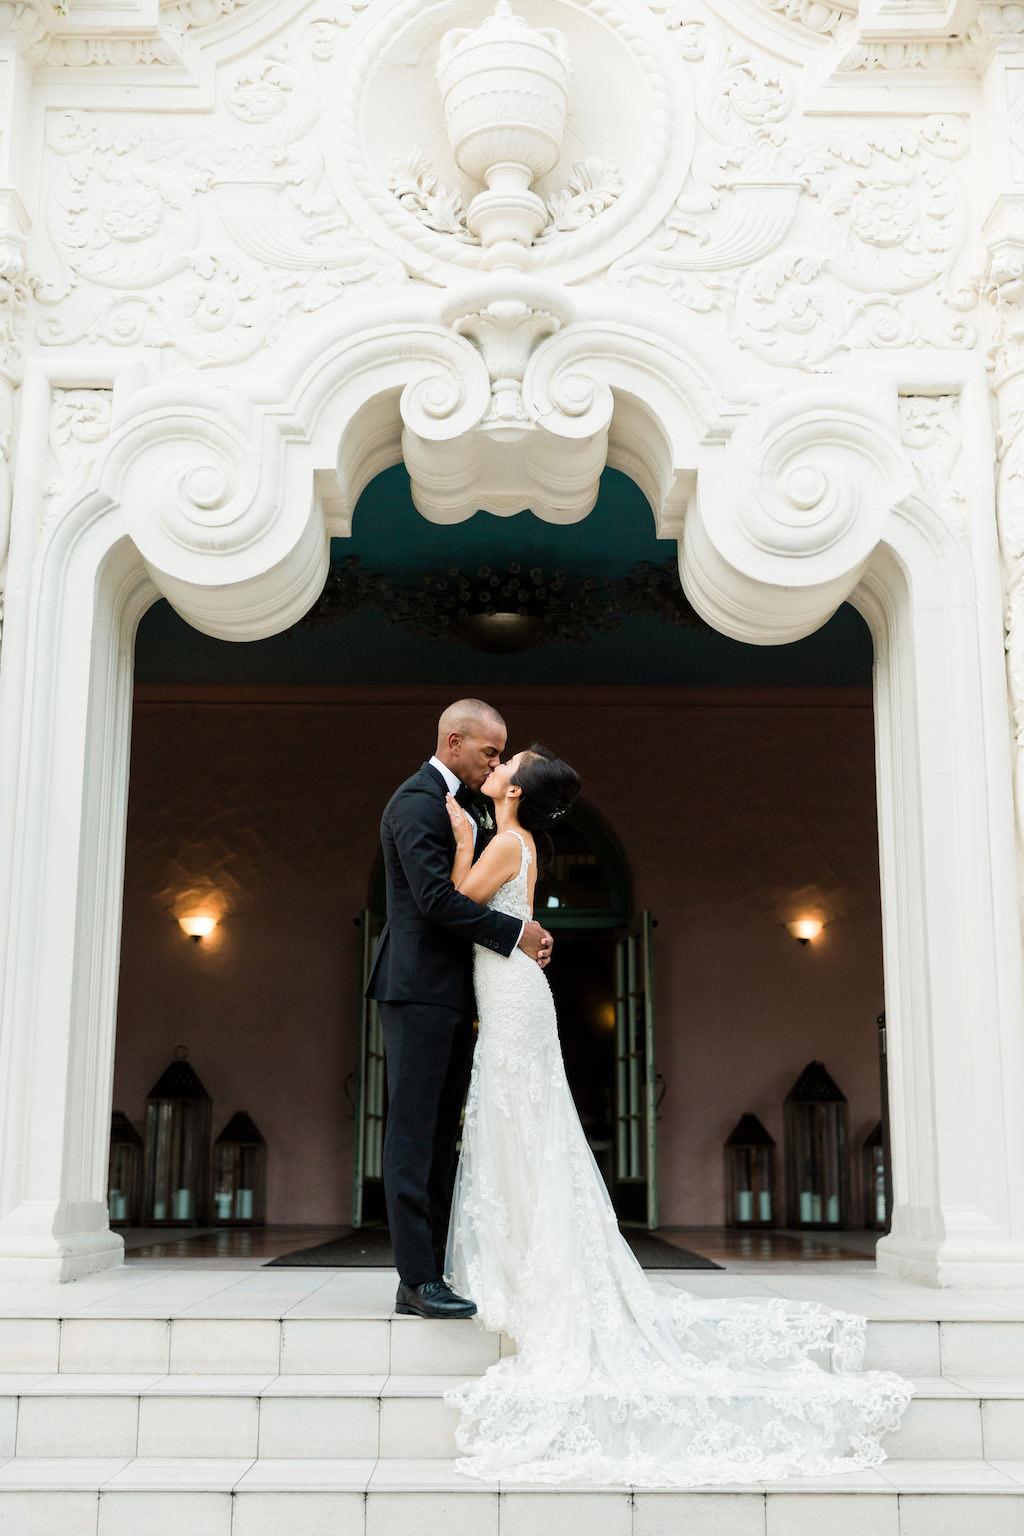 Modern Bride and Groom Romantic Kissing Wedding Portrait | Downtown St. Pete Resort at The Vinoy Renaissance Resort & Golf Club